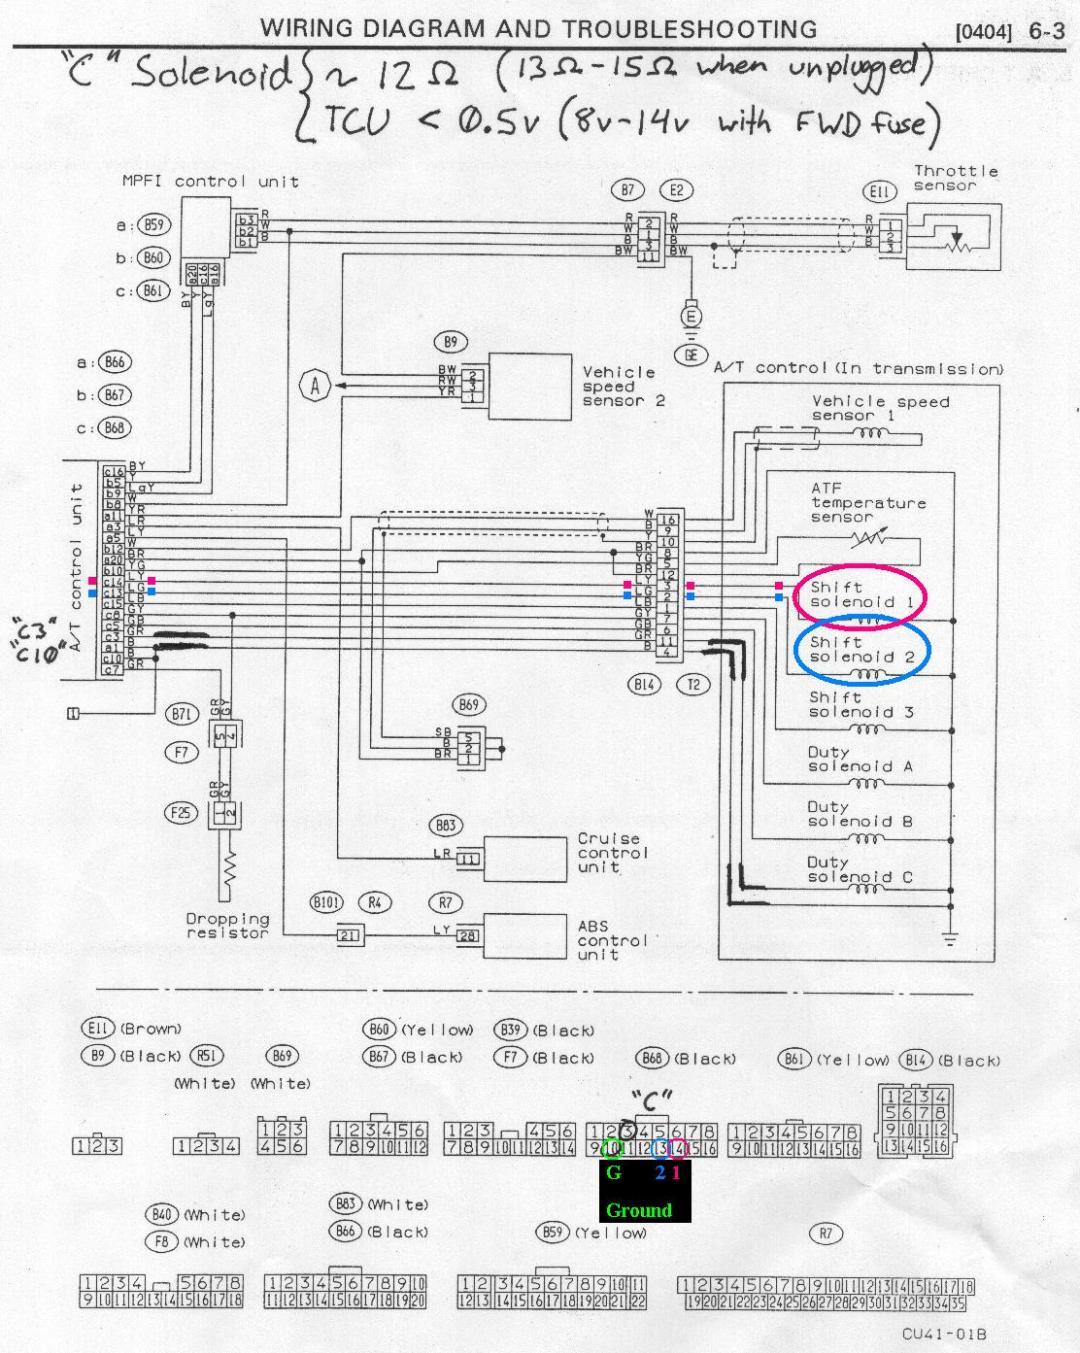 abs chrysler m engine diagram all about repair and wiring abs chrysler m engine diagram description subaru outback stereo wiring diagram wiring diagram 16905 subaru